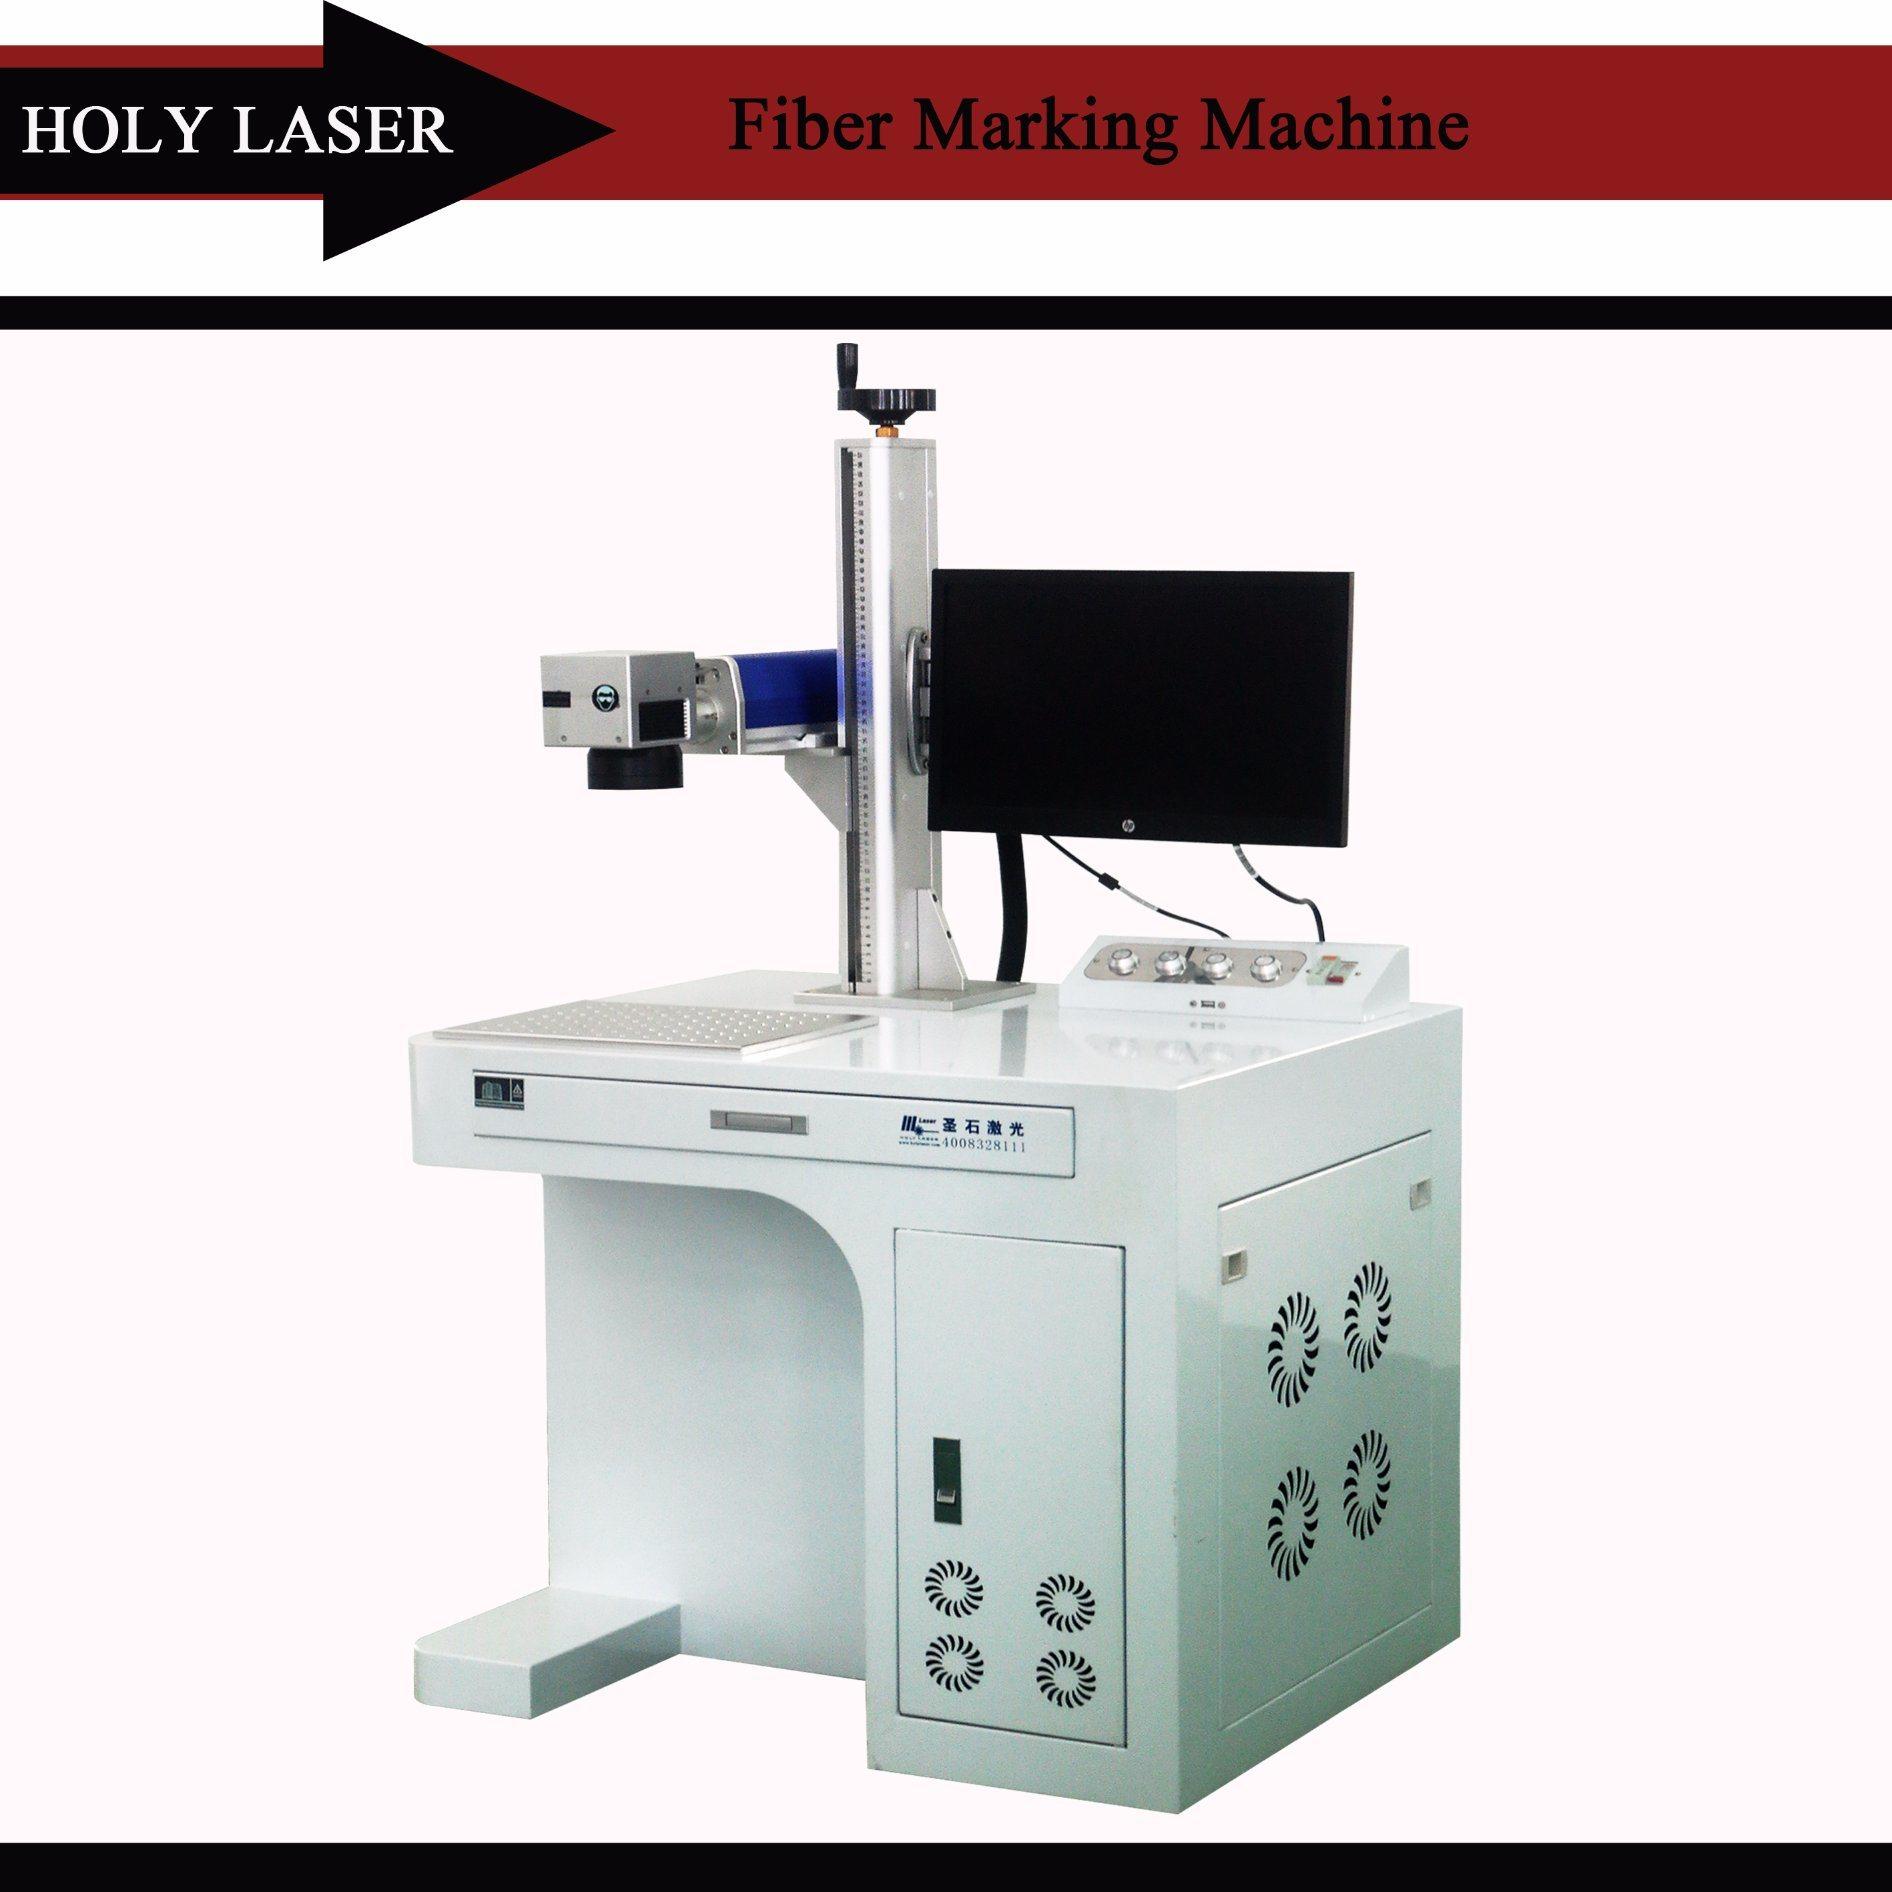 Holy Laser Fiber Laser Jewelry Metal Stainless Steel Marking Machine